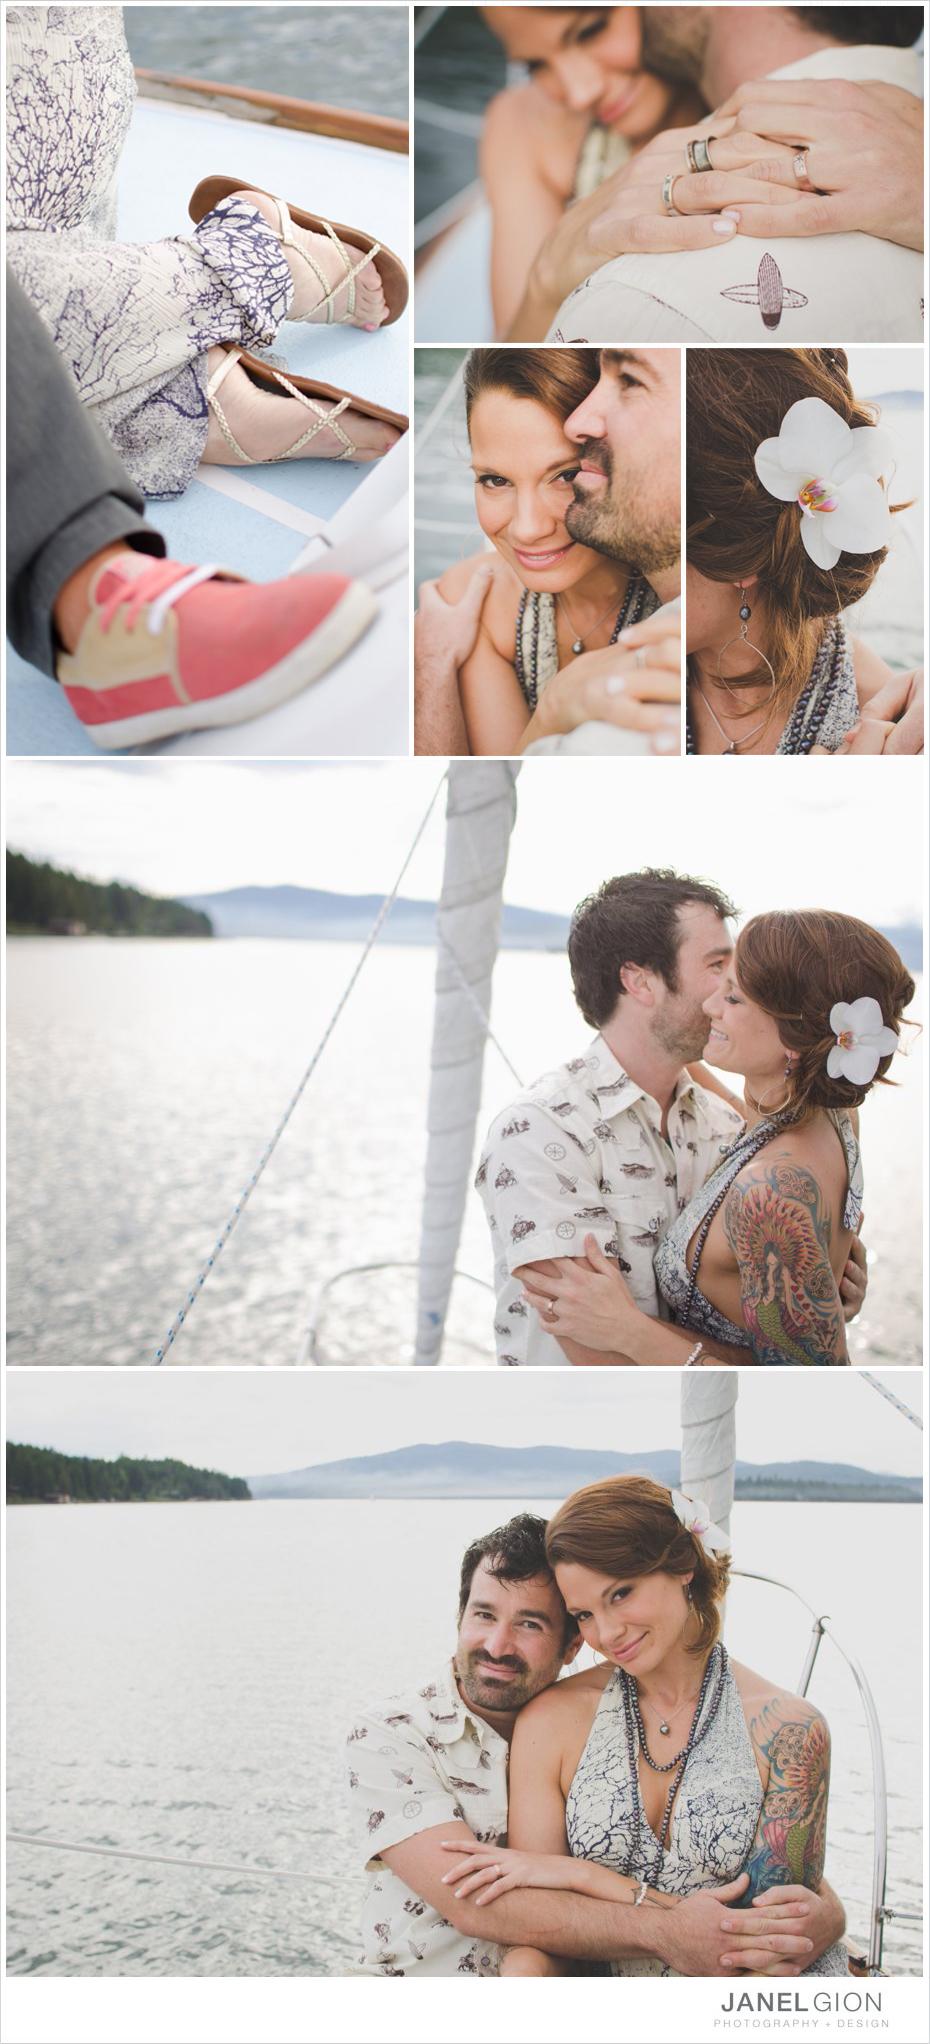 Janel-Gion-sailboat-beach-bikes-engagement-photos_0012-22.jpg